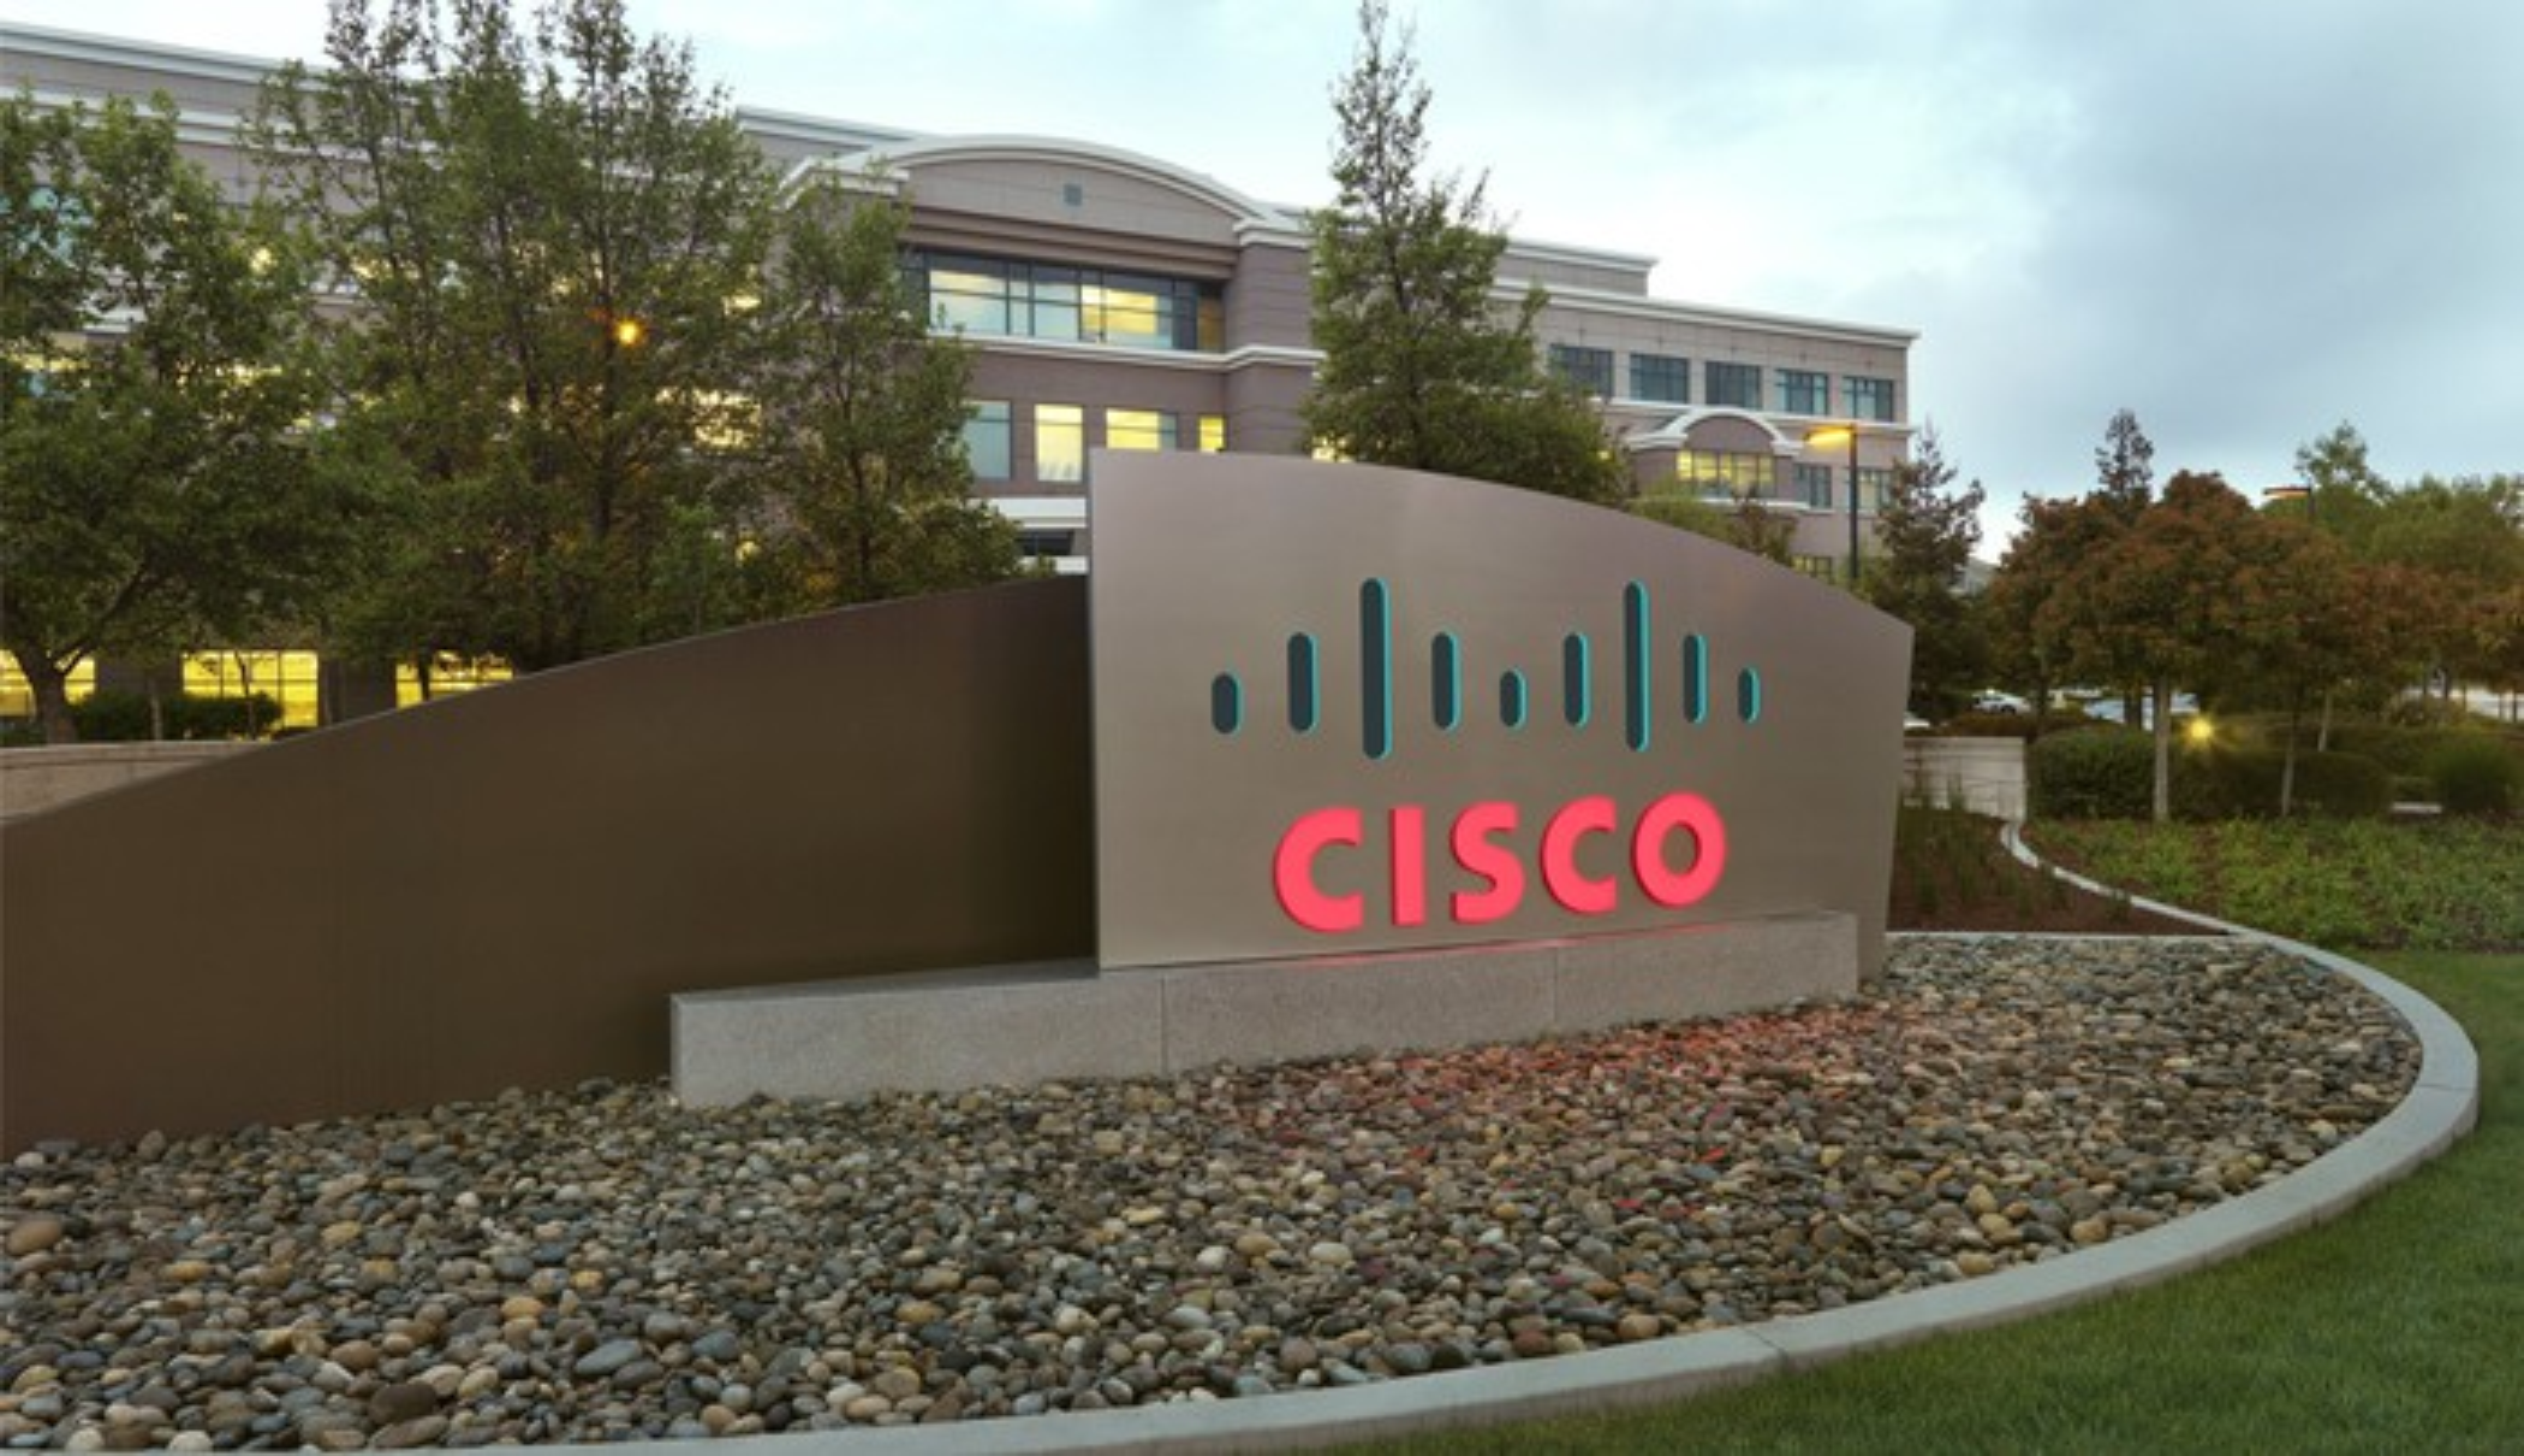 Cisco's offices.